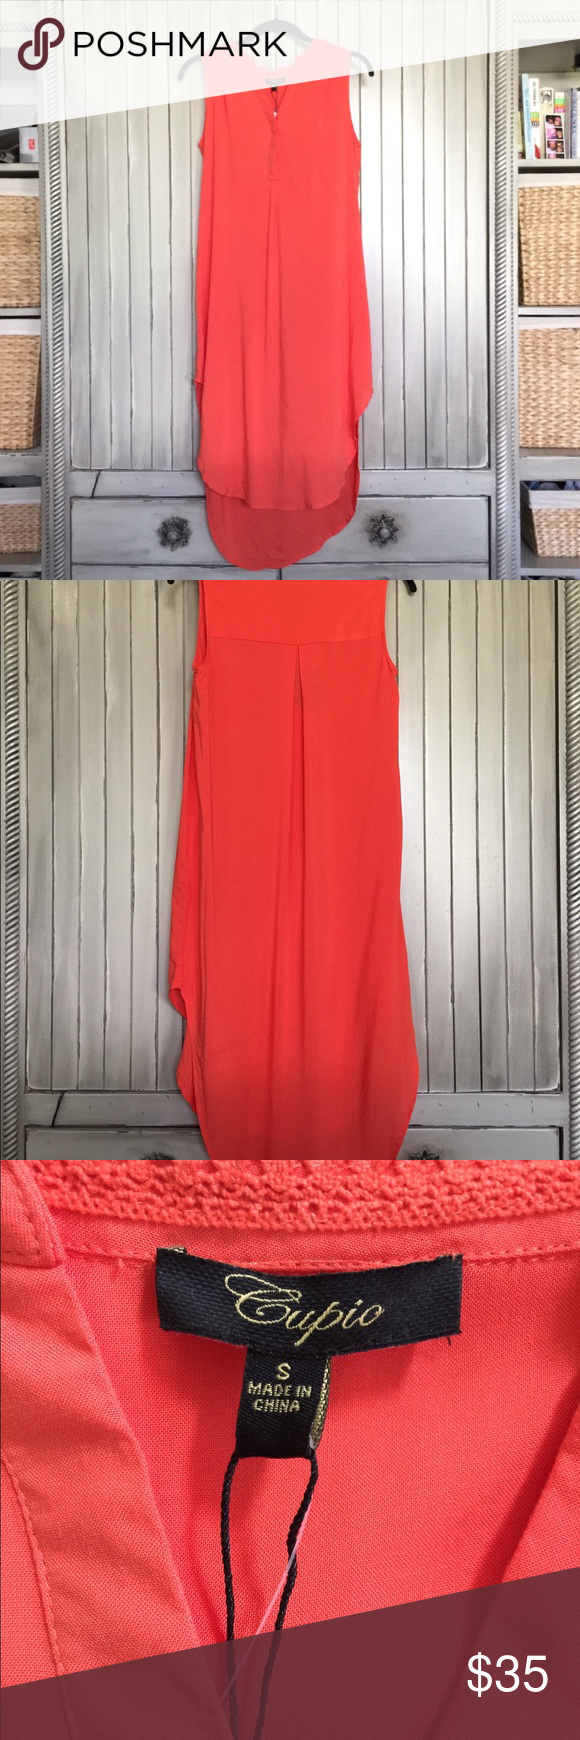 48bdaf694c6 NWT Cupio Hi Lo Dress Tunic Small Orange This is an orange Cupio hi